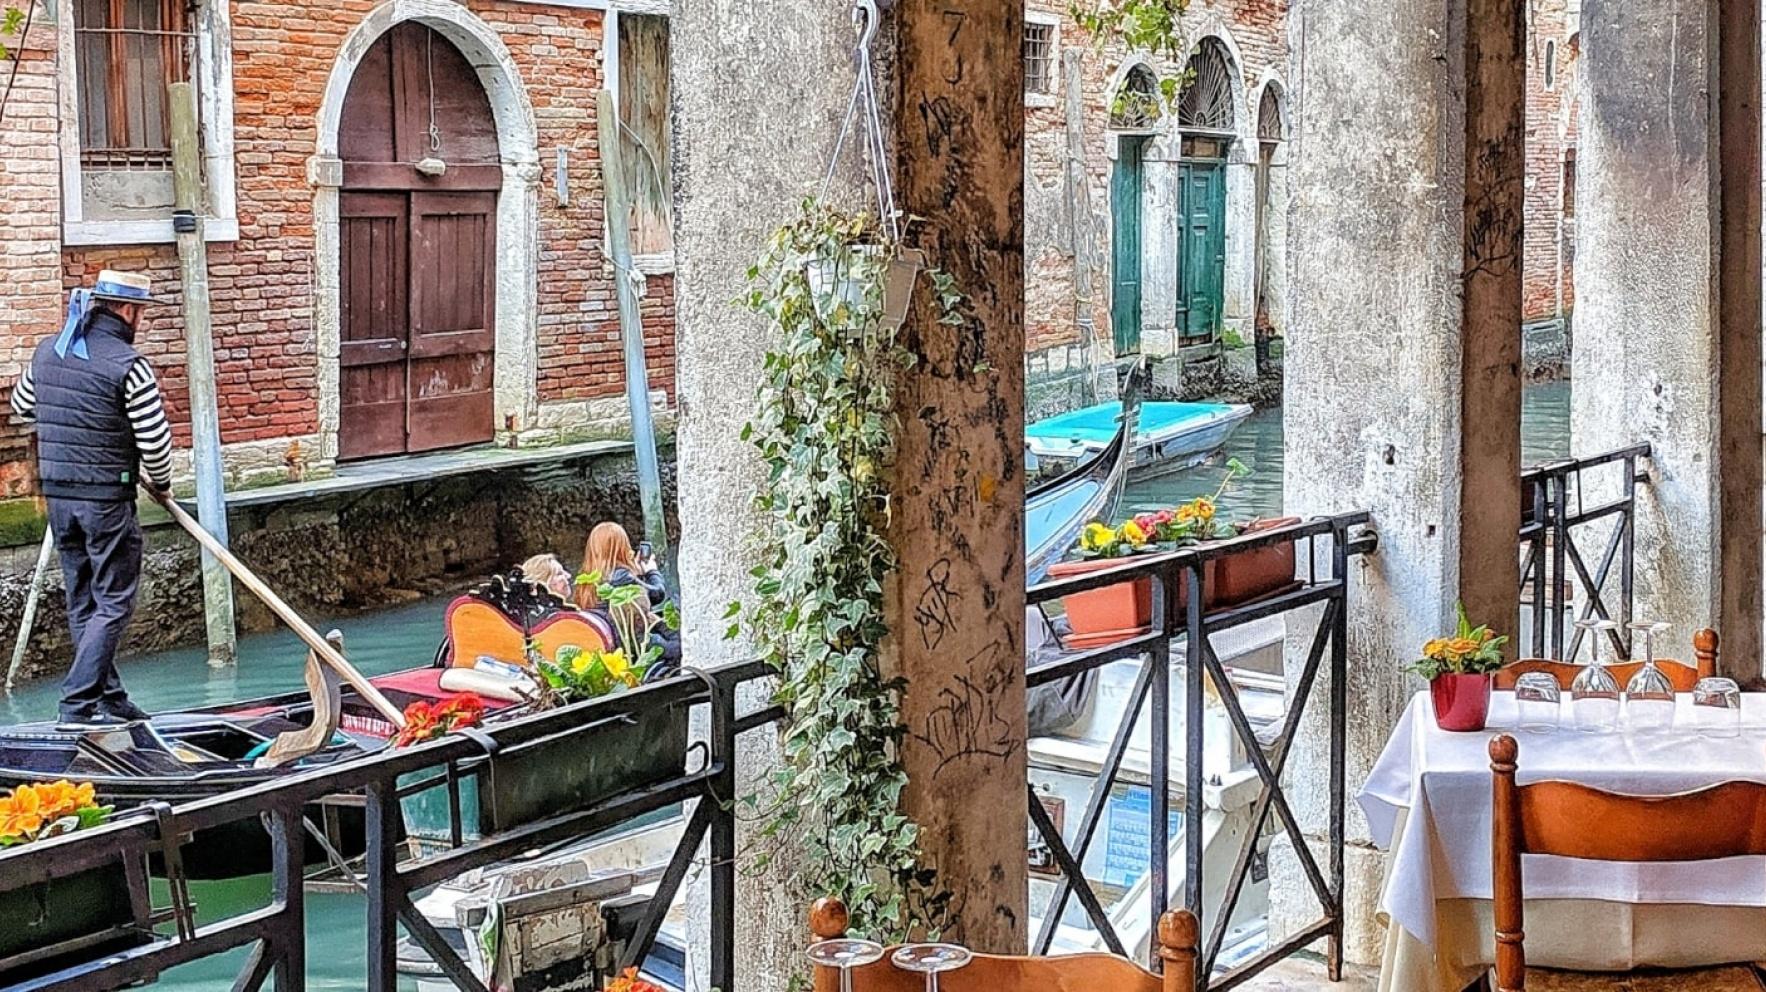 Venice Italy Tour